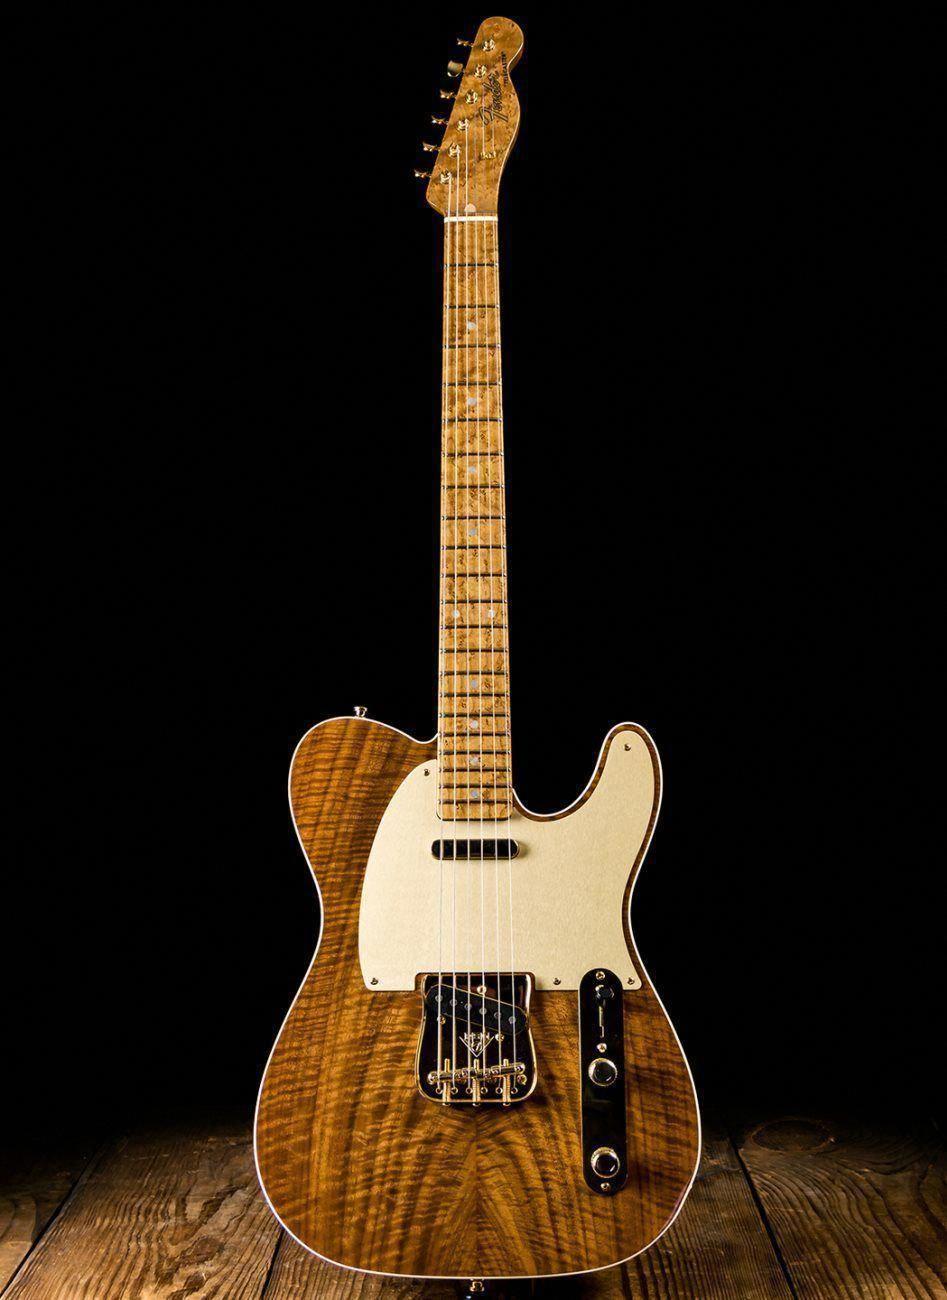 Fender Guitar T Shirts For Men Fender Guitar Truss Rod Wrench #guitargear #guitarphotography #FenderGuitars #fenderguitars